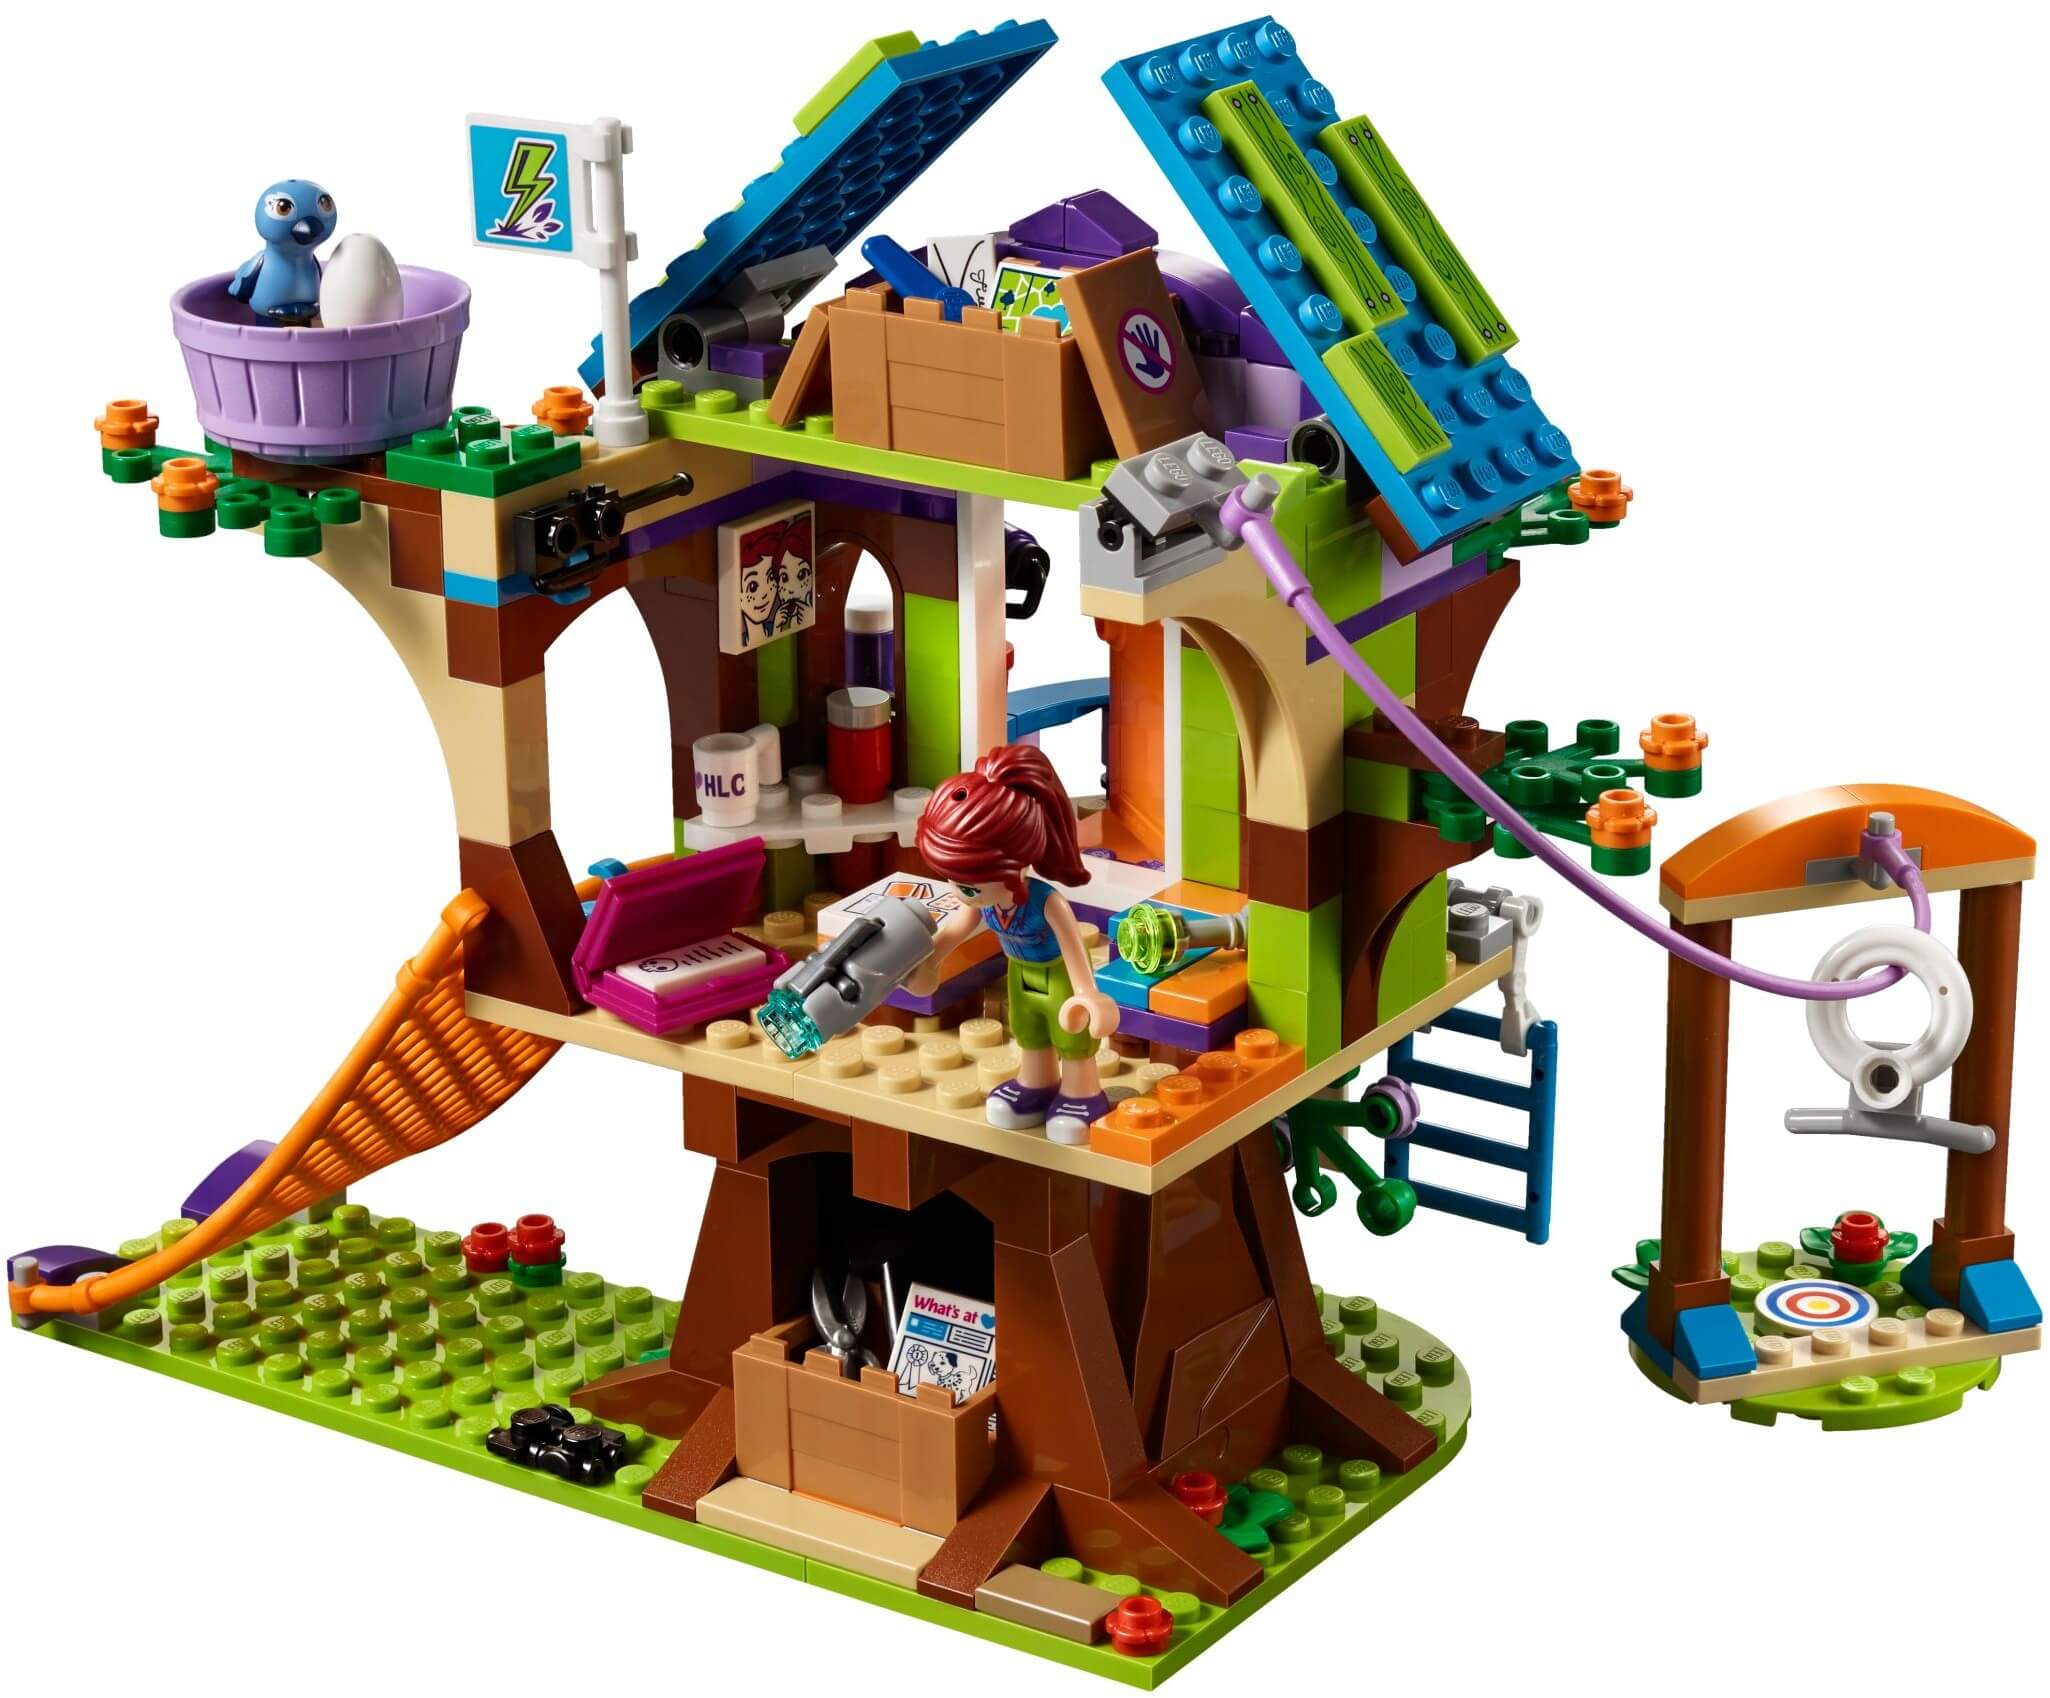 Mua đồ chơi LEGO 41335 - LEGO Friends 41335 - Ngôi Nhà trên Cây của Mia (LEGO Friends 41335 Mia's Tree House)